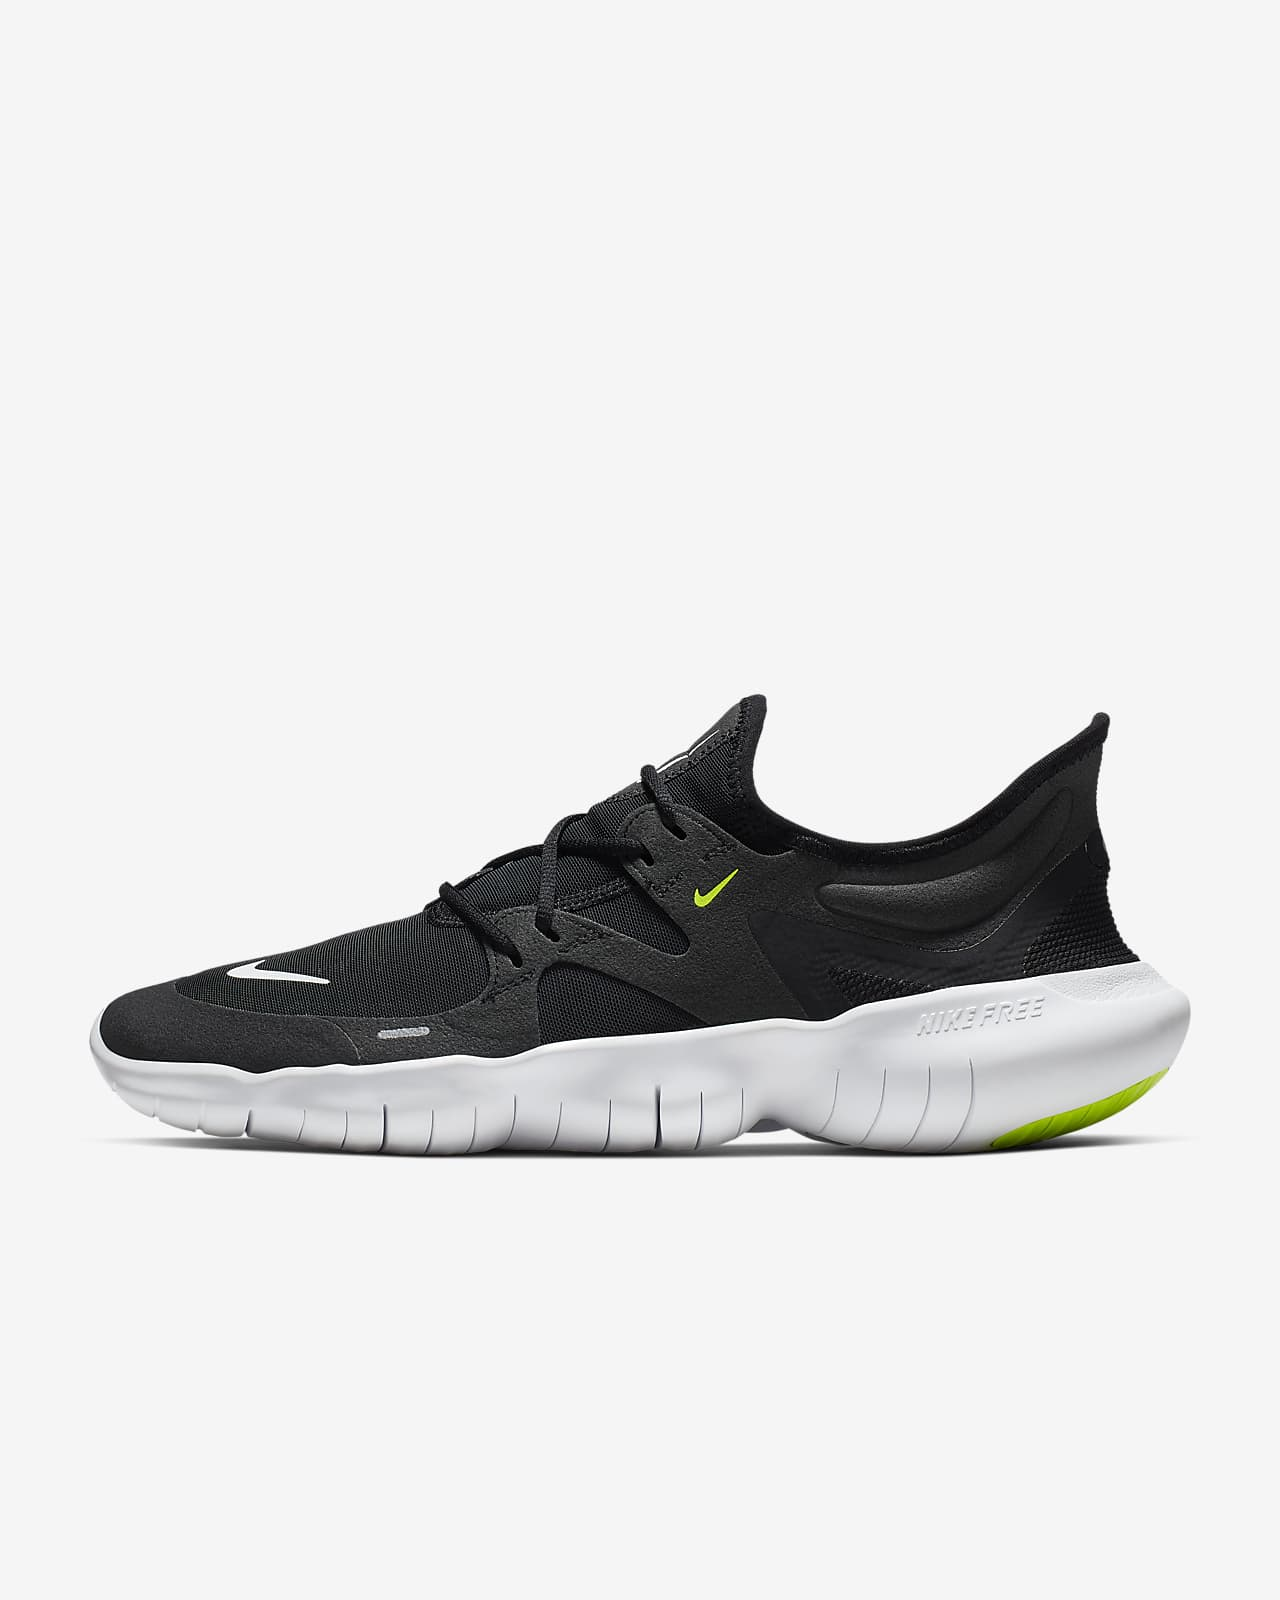 Nike Free RN 5.0 férfi futócipő